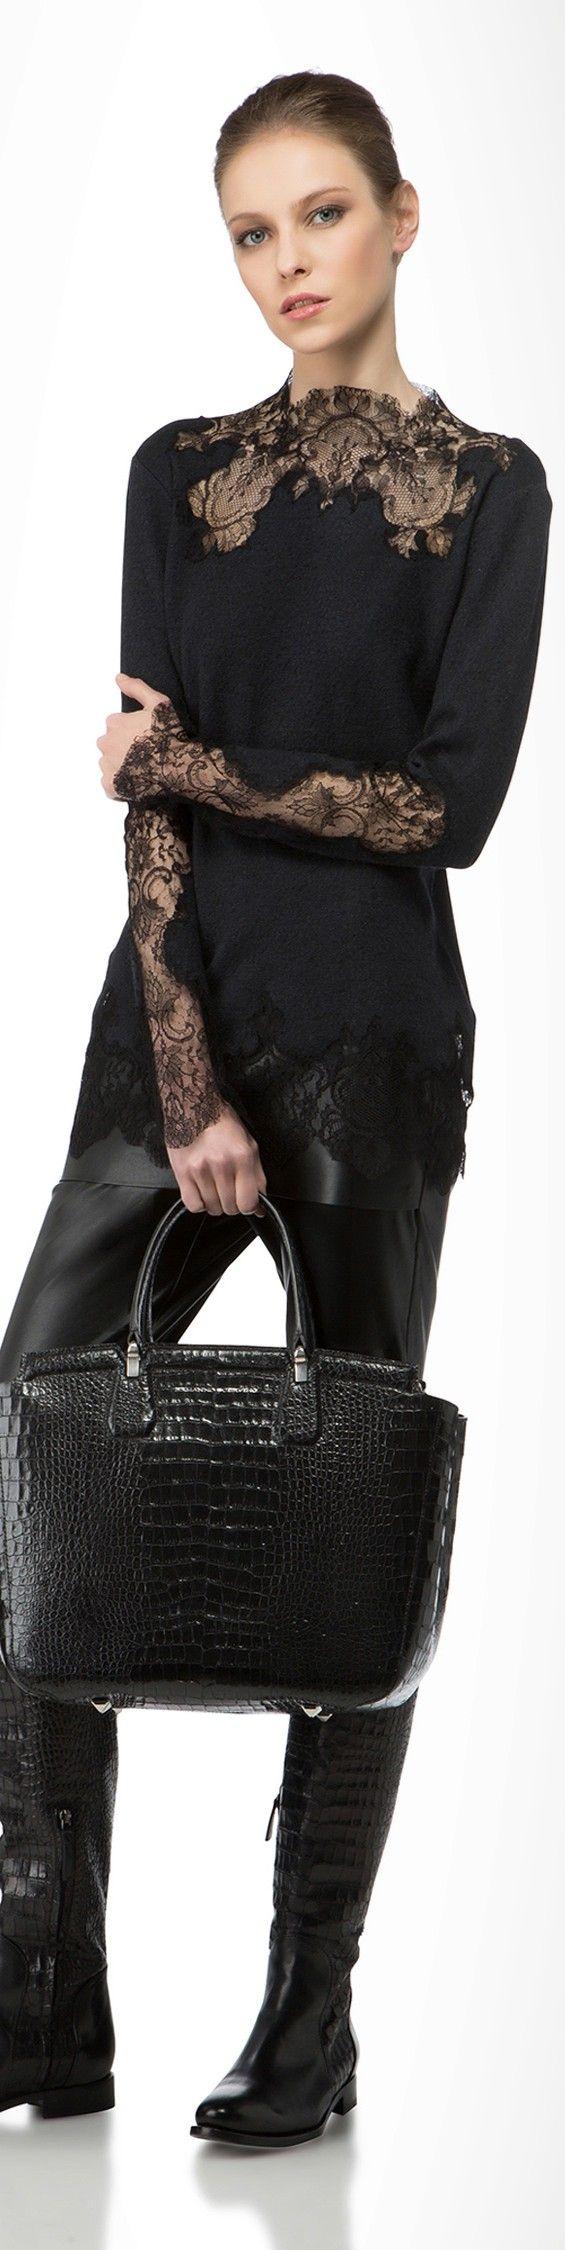 Black beauty..!! #jewelexi #fashion_desire